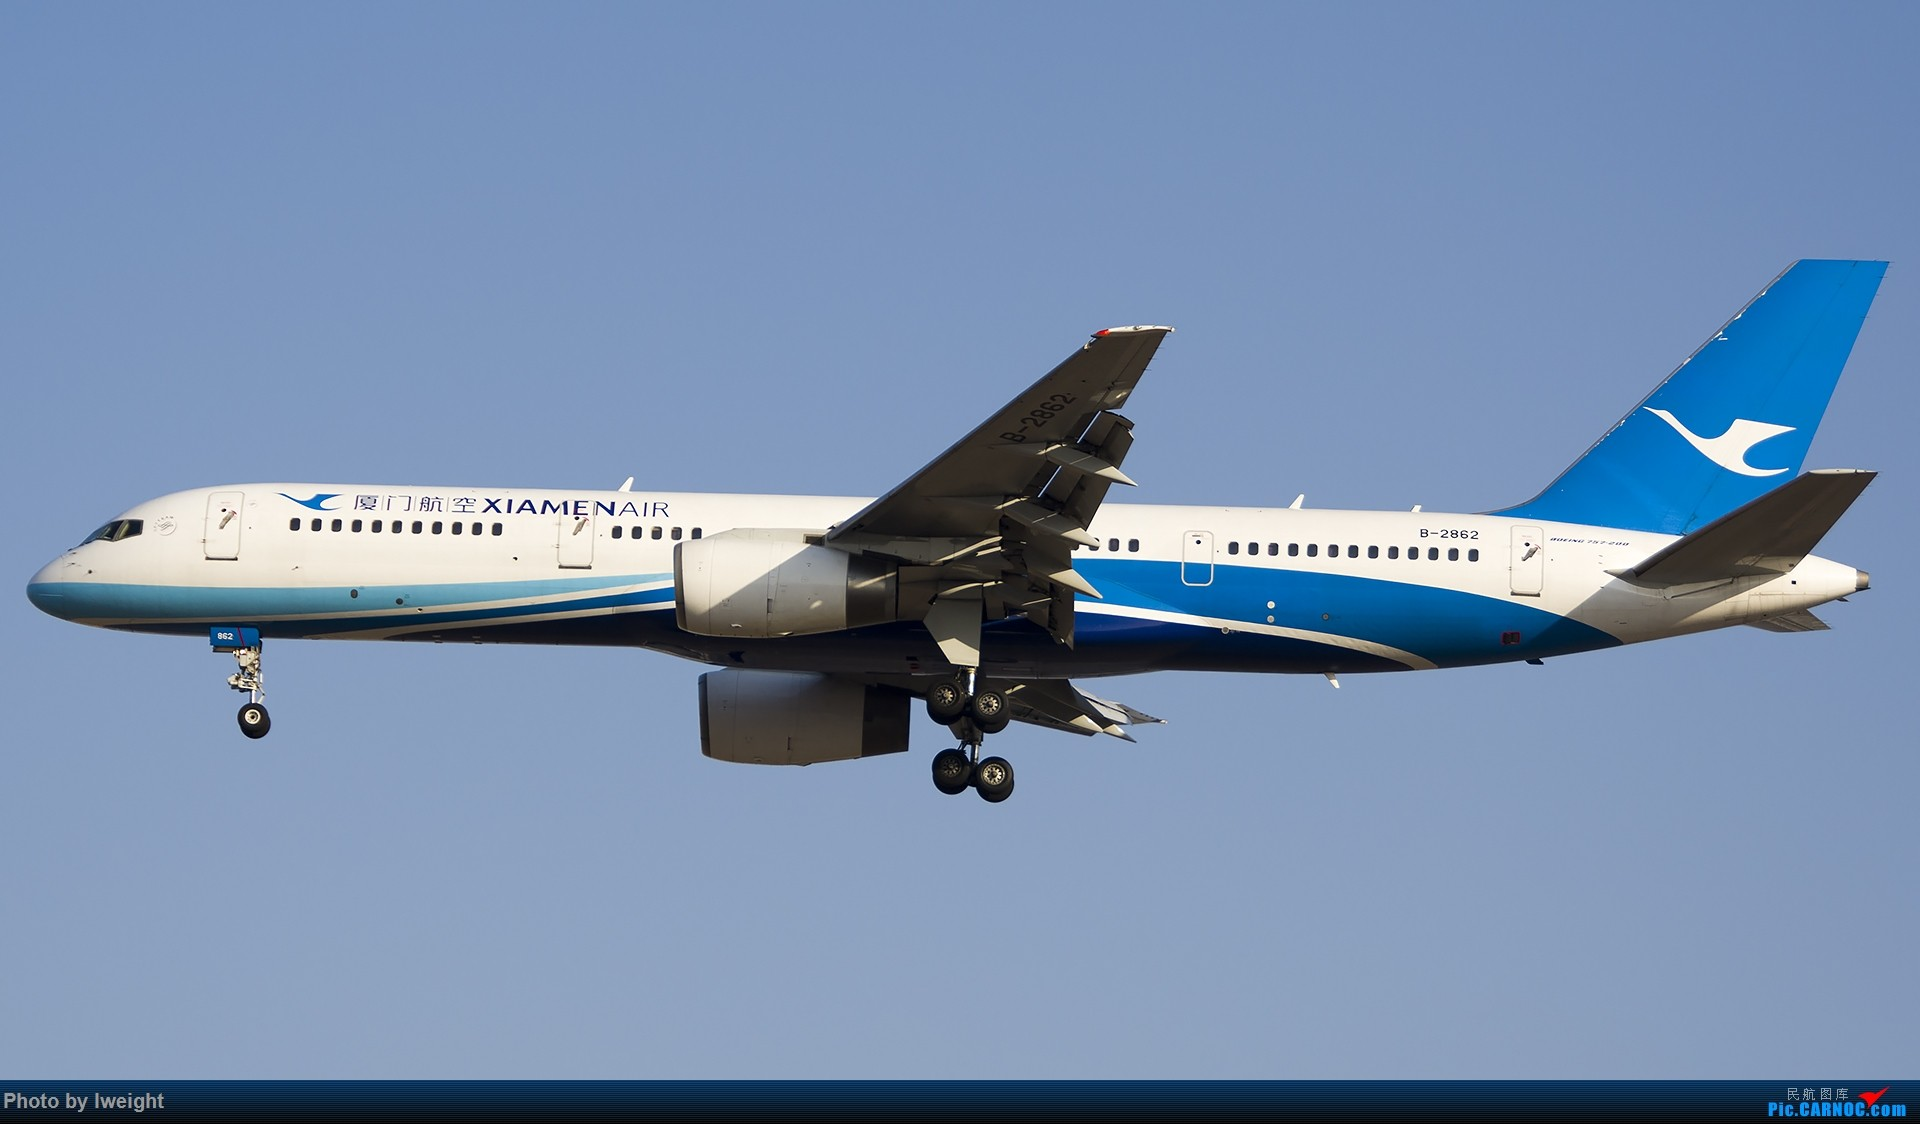 Re:[原创]庆祝升级777,发上今天在首都机场拍的所有飞机【2014-12-14】 BOEING 757-200 B-2862 中国北京首都国际机场